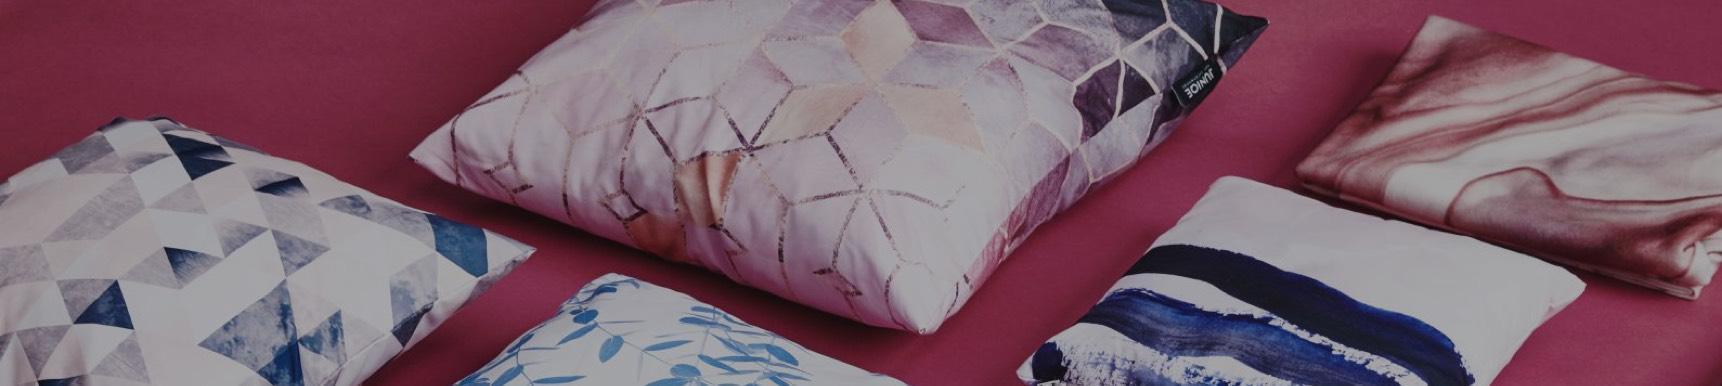 geschenke online ausgefallene geschenkideen f r jeden anlass juniqe. Black Bedroom Furniture Sets. Home Design Ideas